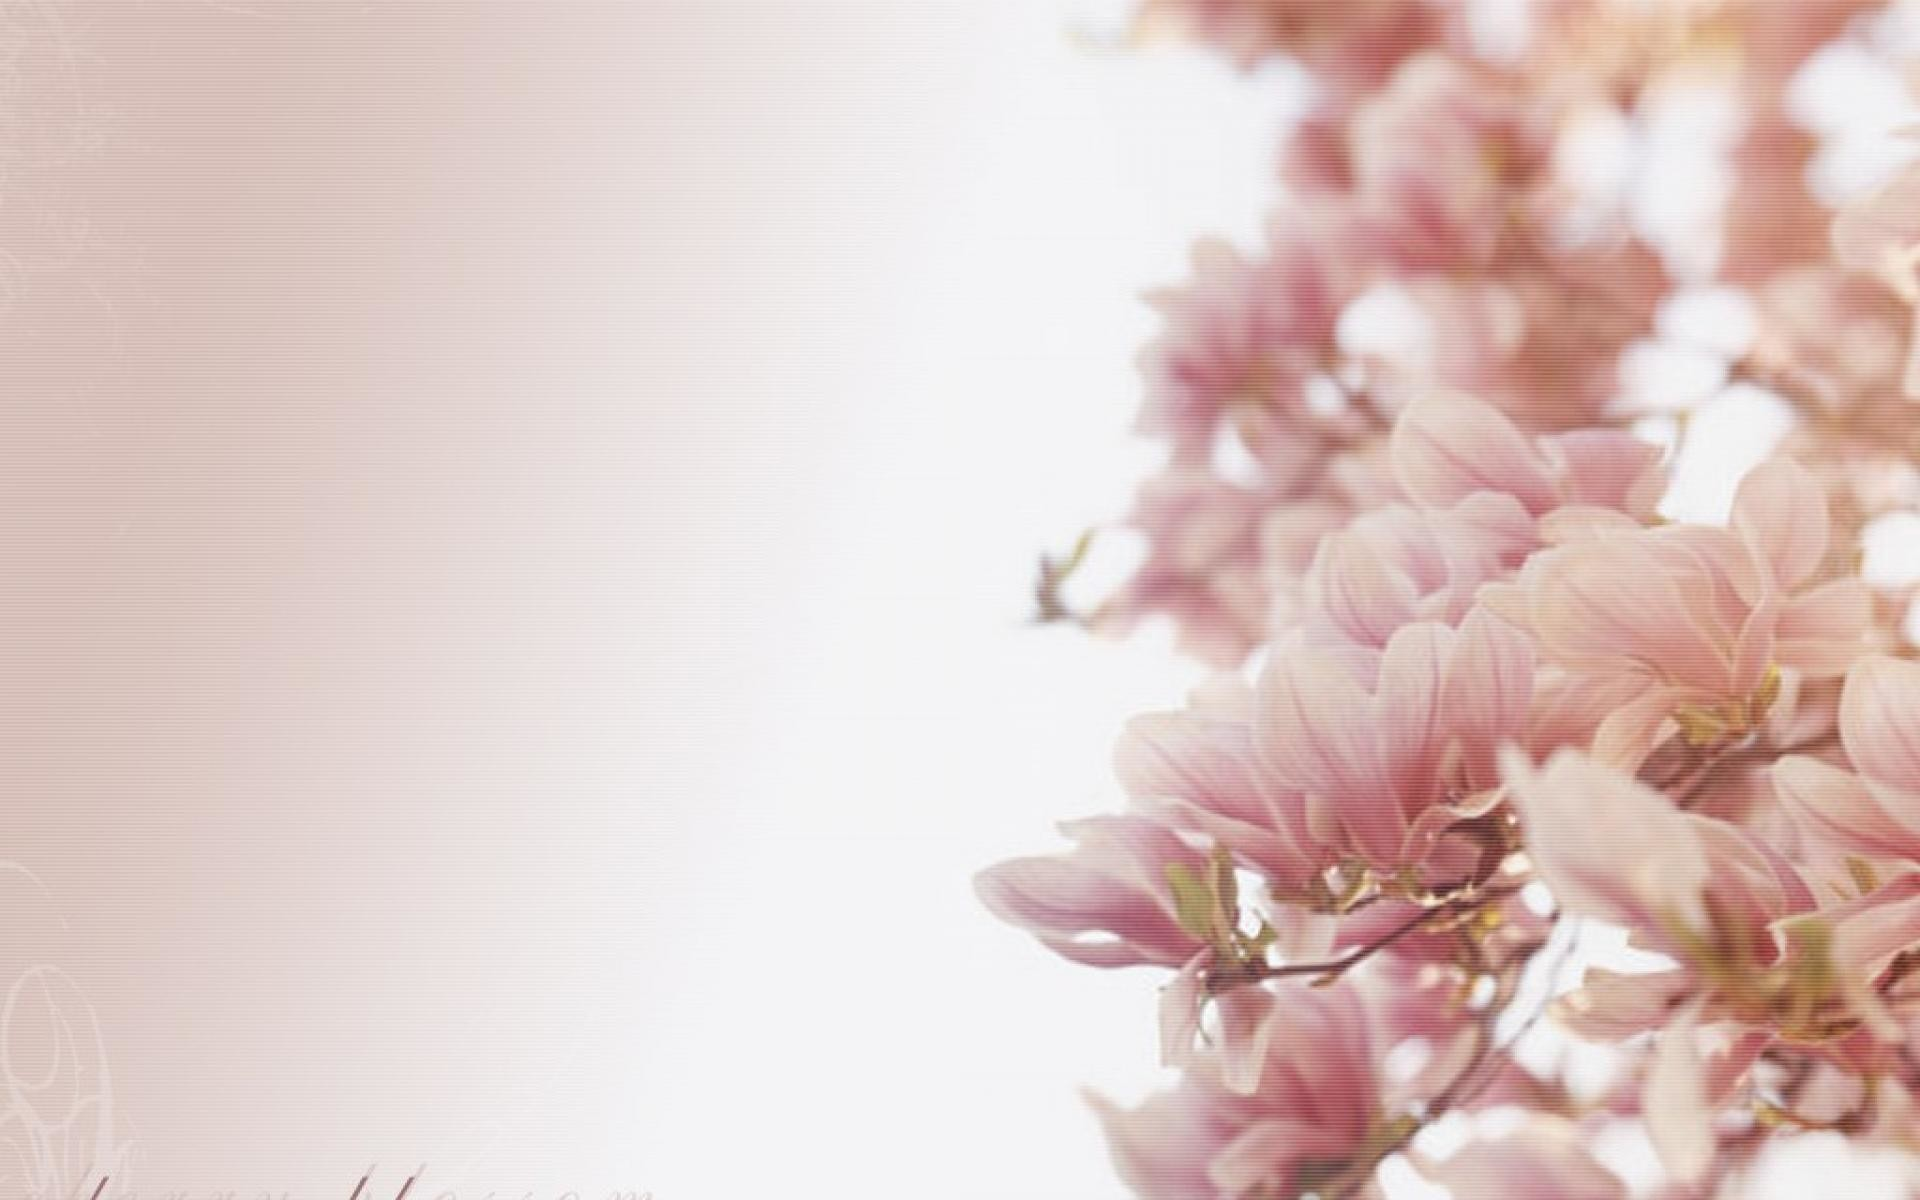 Hd-cherry-blossom-1080p-wallpapers-white.jpg (1920×